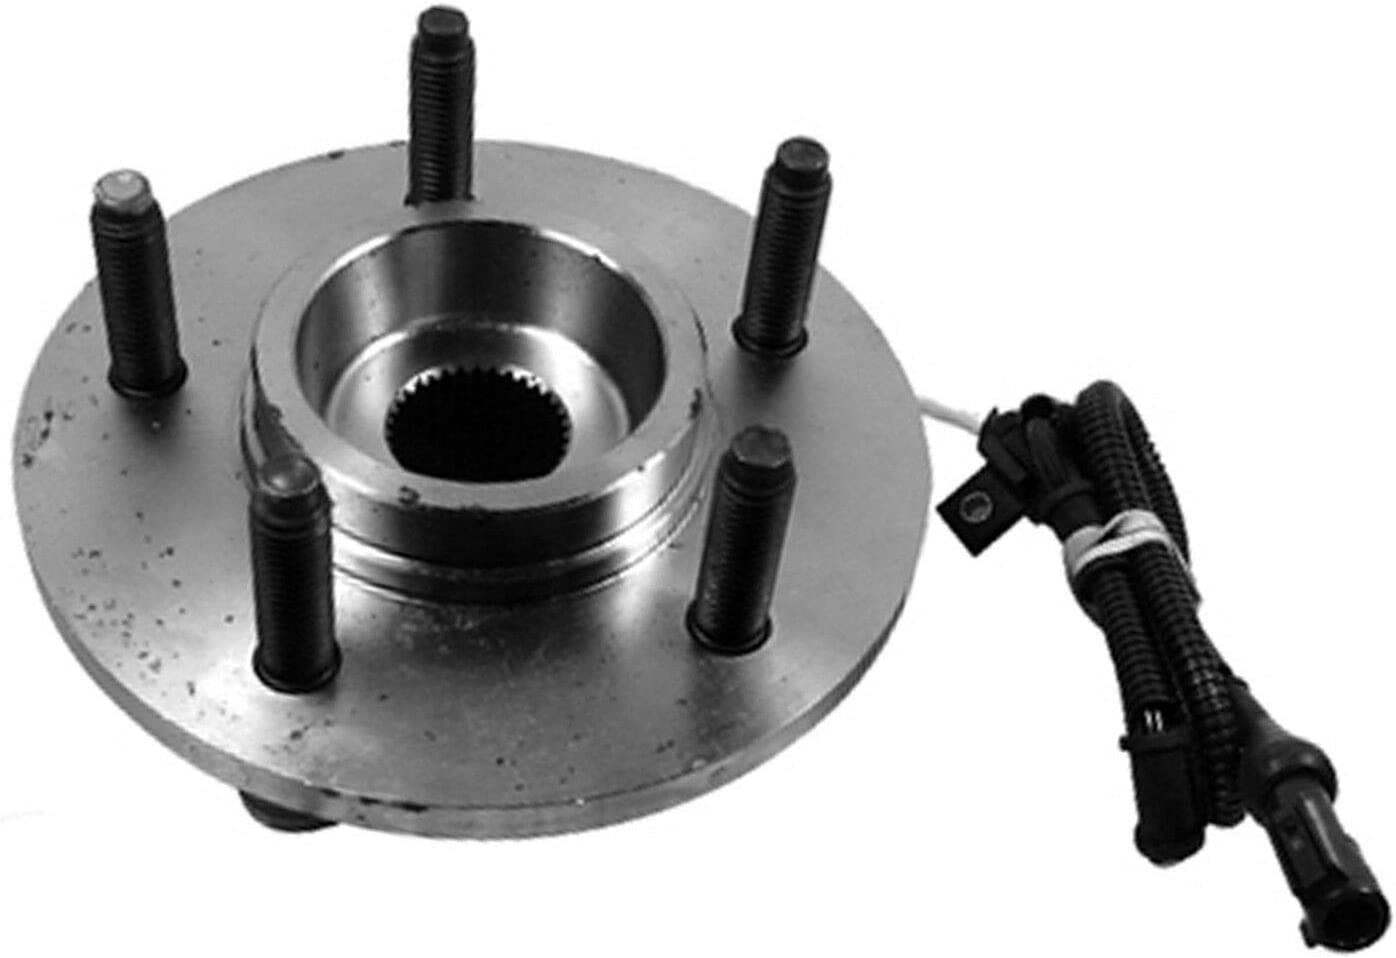 MarMax Performance New Sea Water Cooling Pump Impeller Kit for Volvo Penta 4.3L 5.0L 5.7L 3862281 21951346